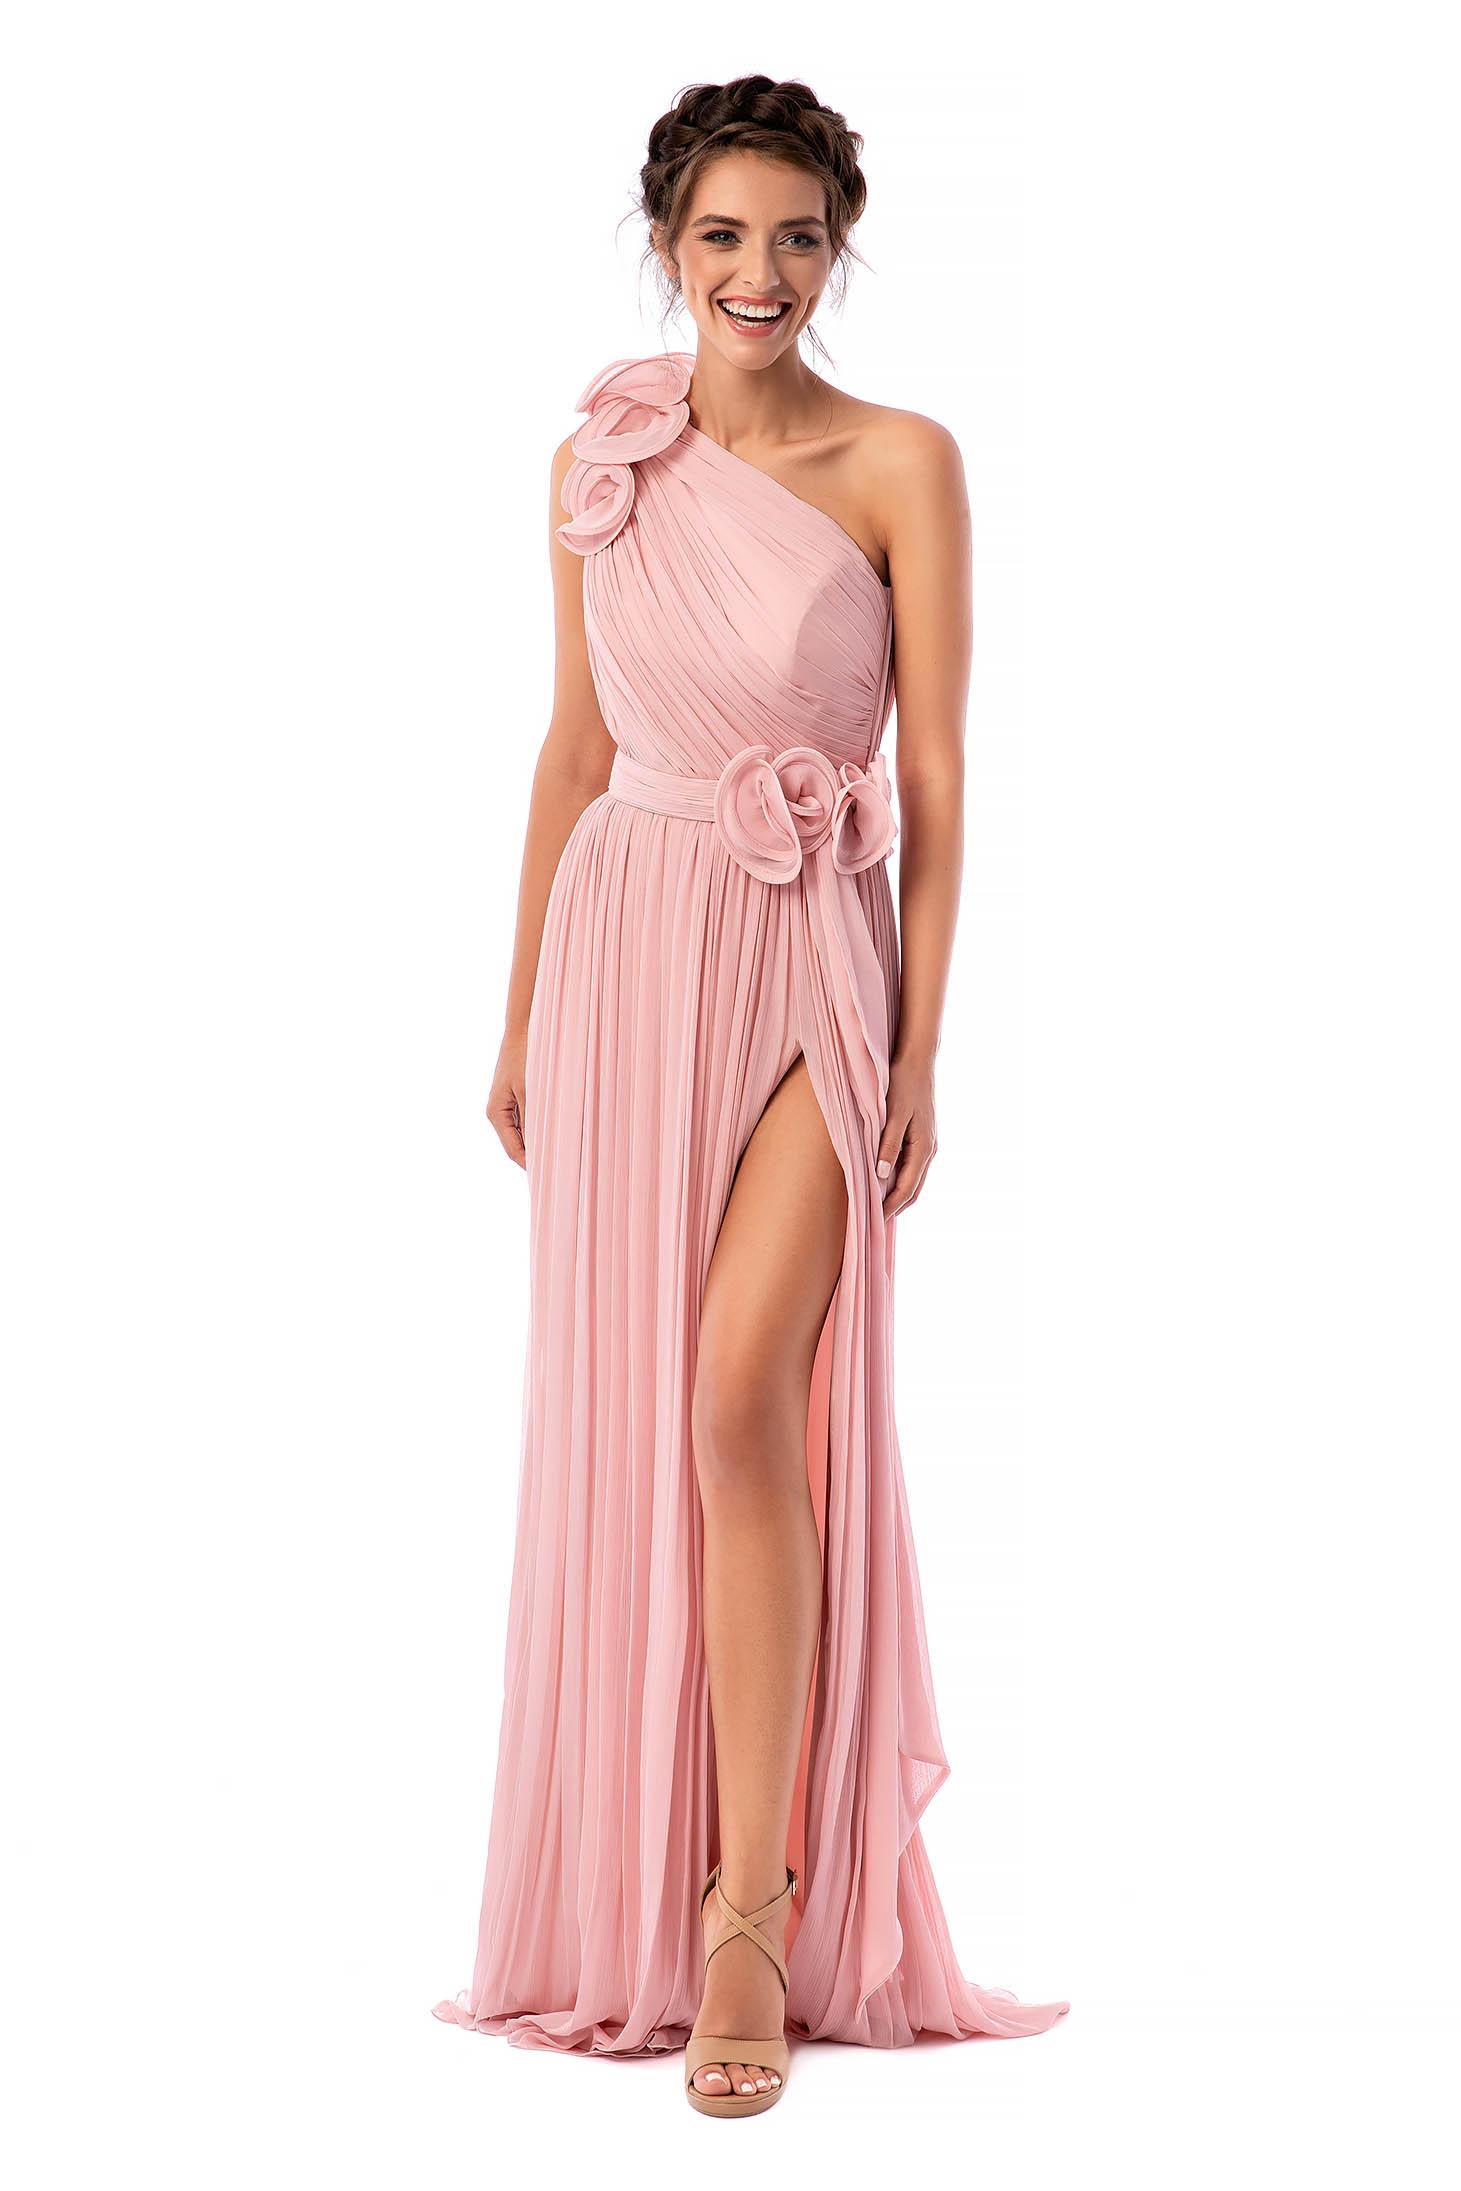 Rochie Ana Radu roz deschis de lux lunga in clos din voal pe umar captusita pe interior